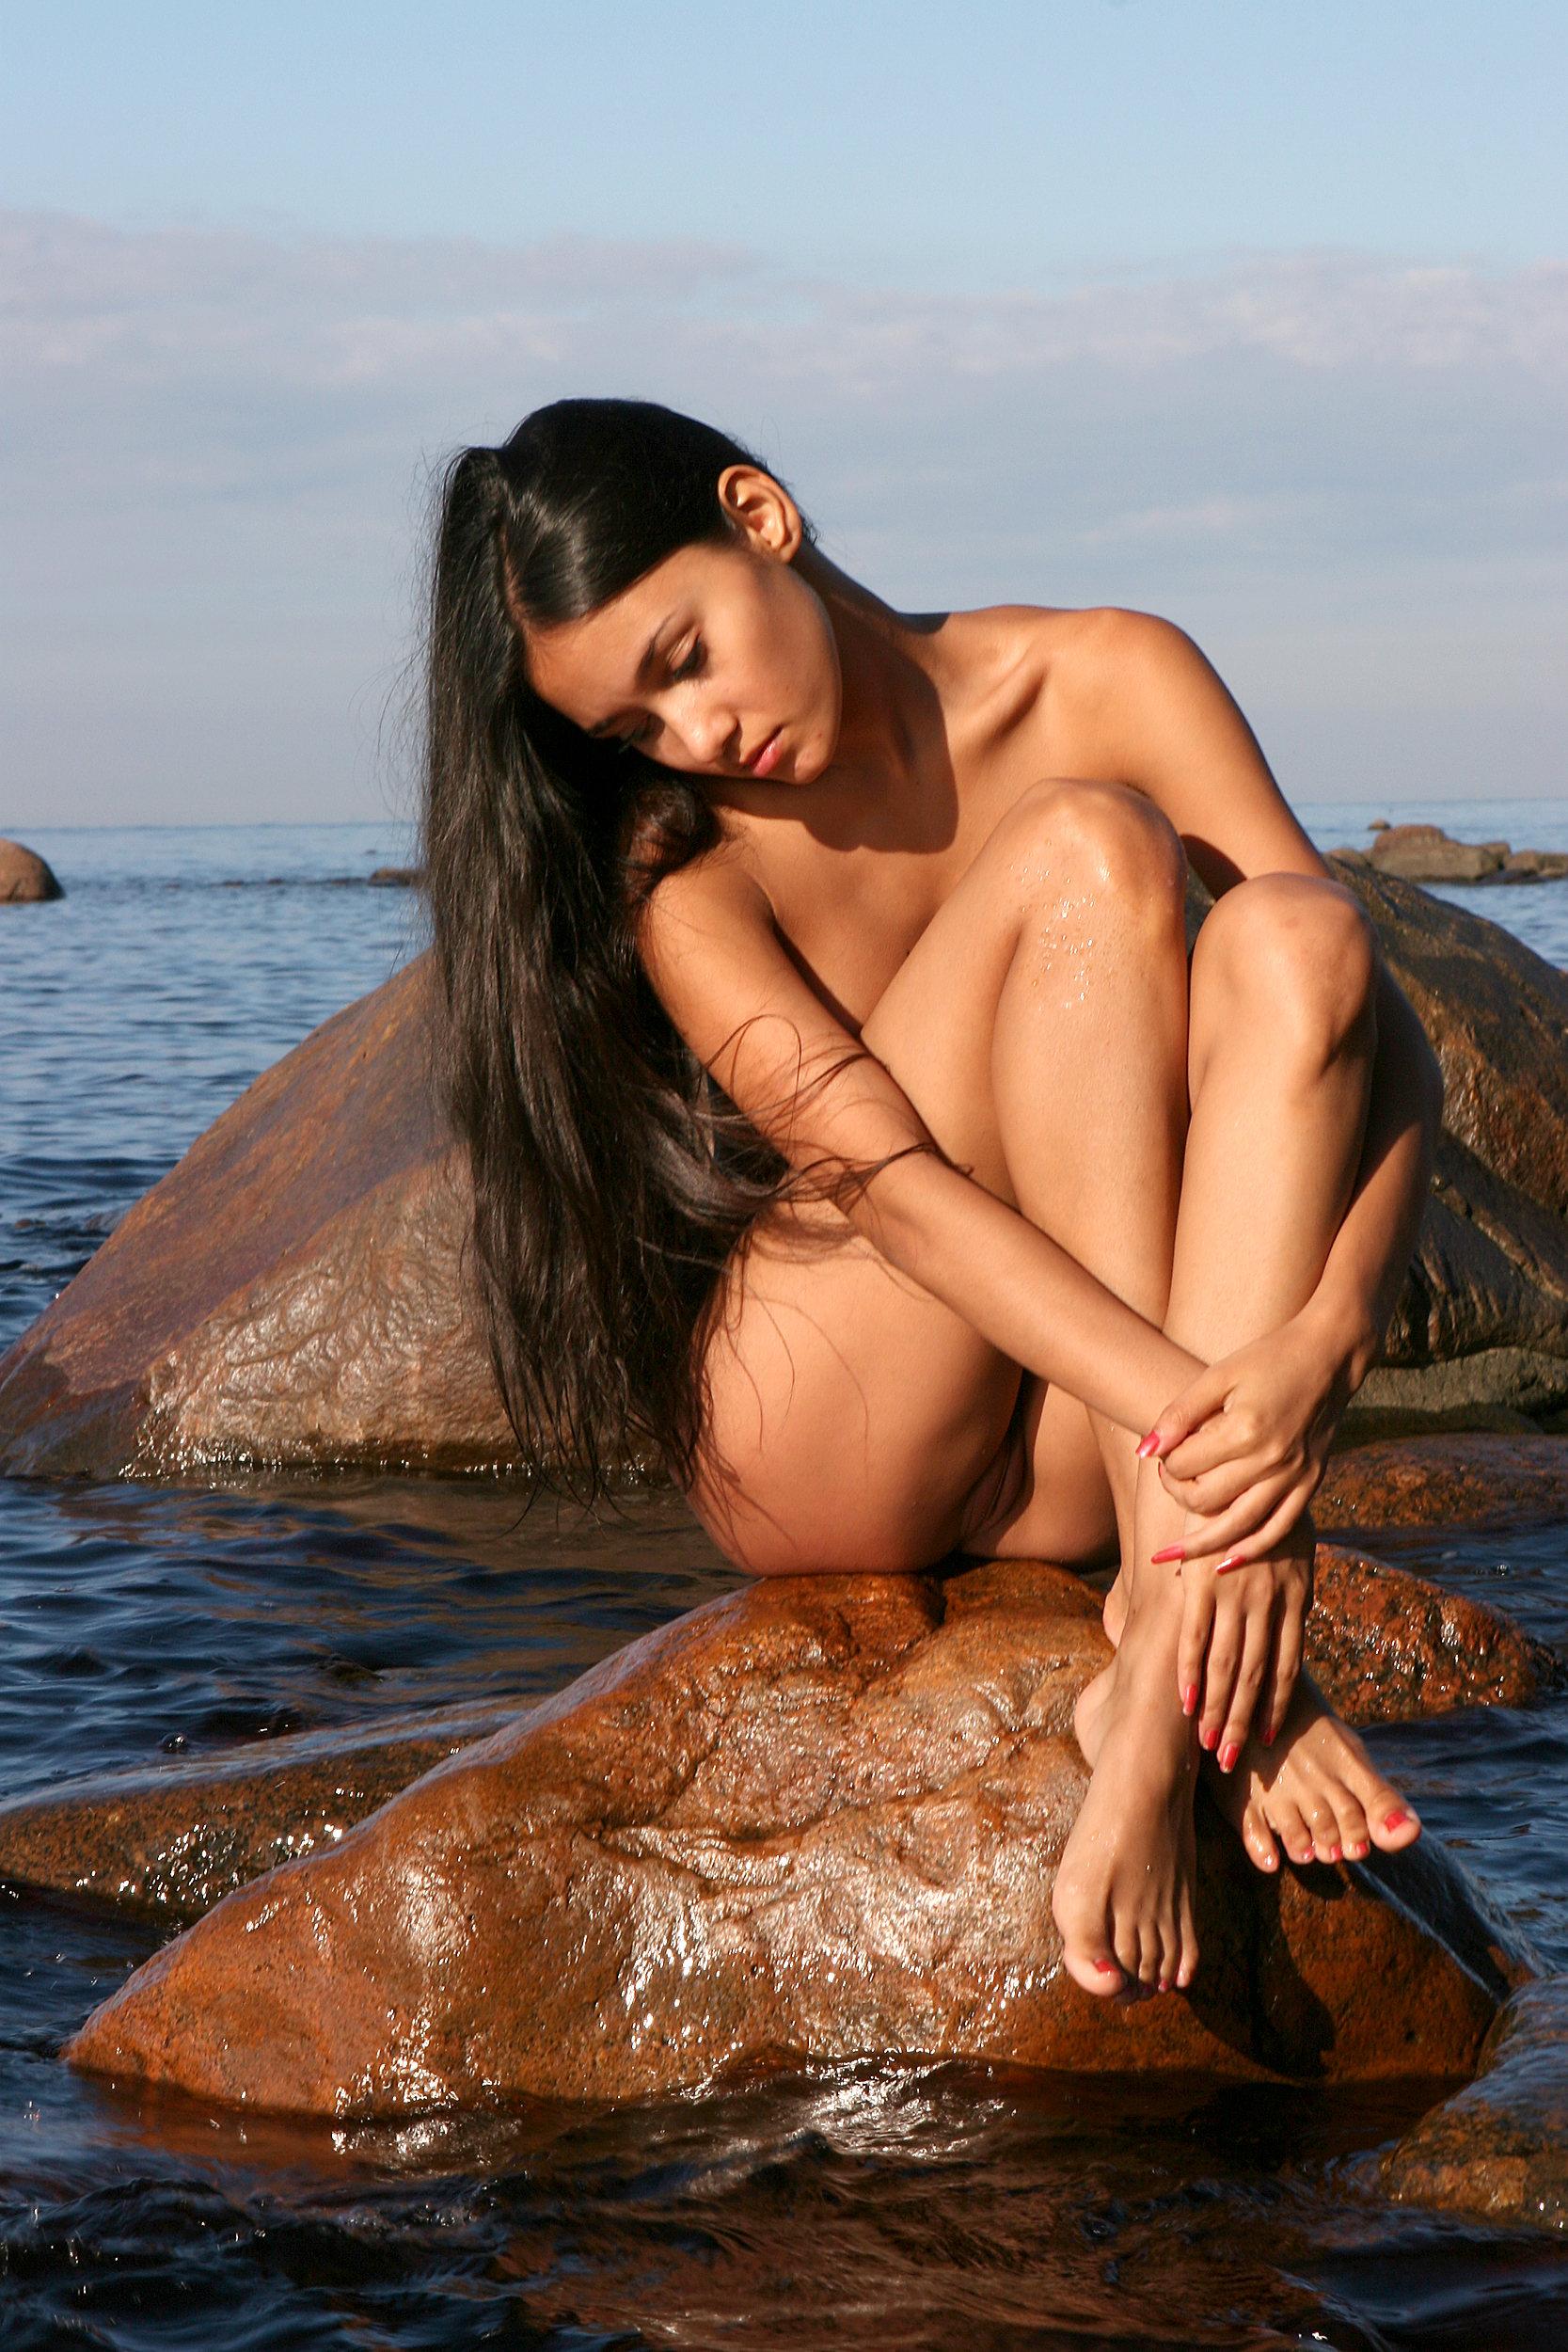 met exotic models art Lissa